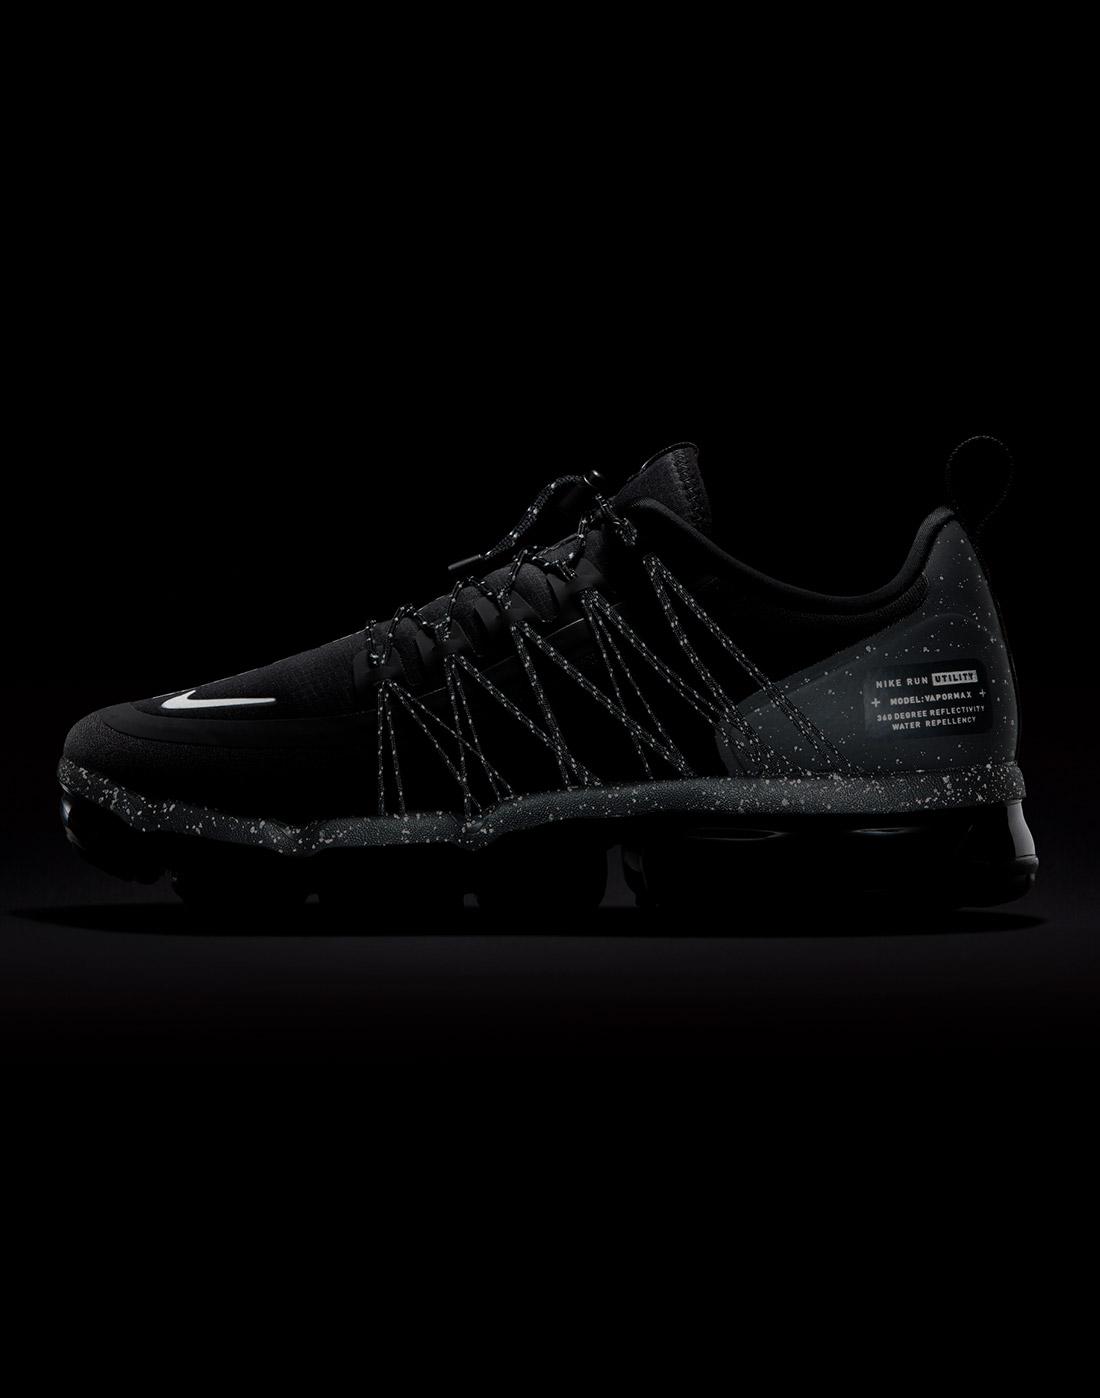 df0bfc3381c0 Men s Black Nike Air VaporMax Utility